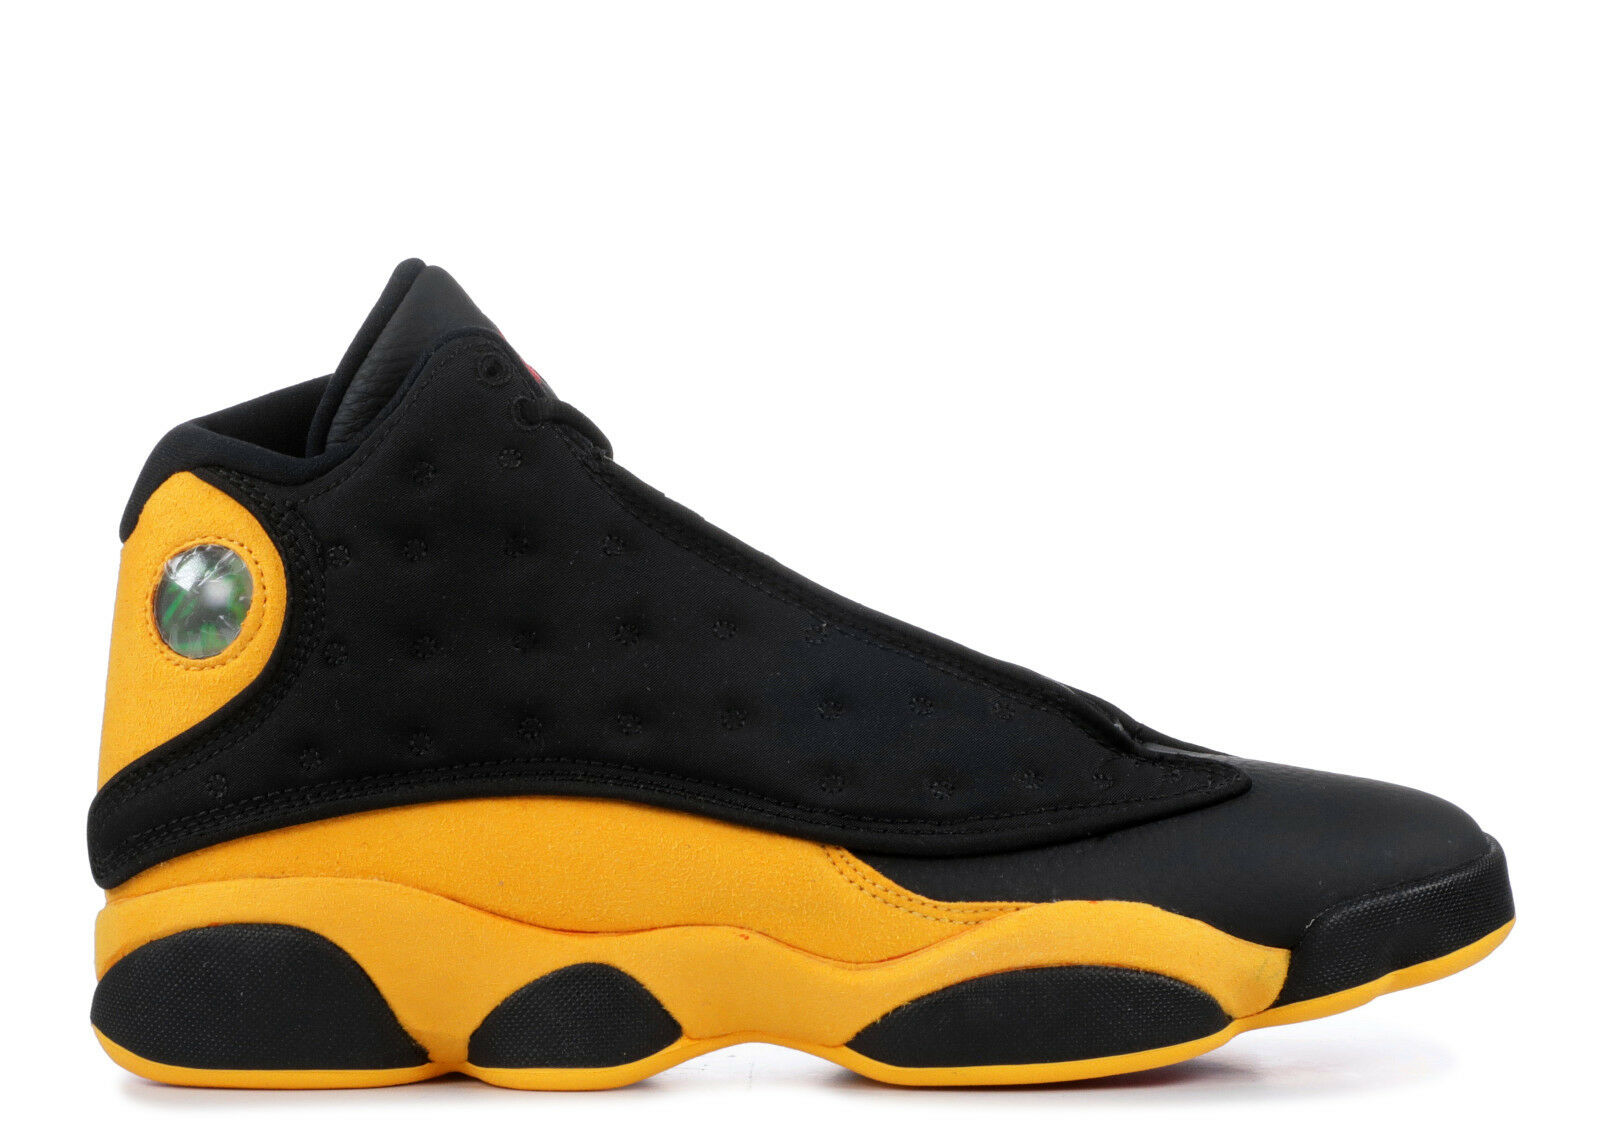 2018 Jordan 13 XIII Melo clase Air de 2002 414571 -035 Carmelo Anthony